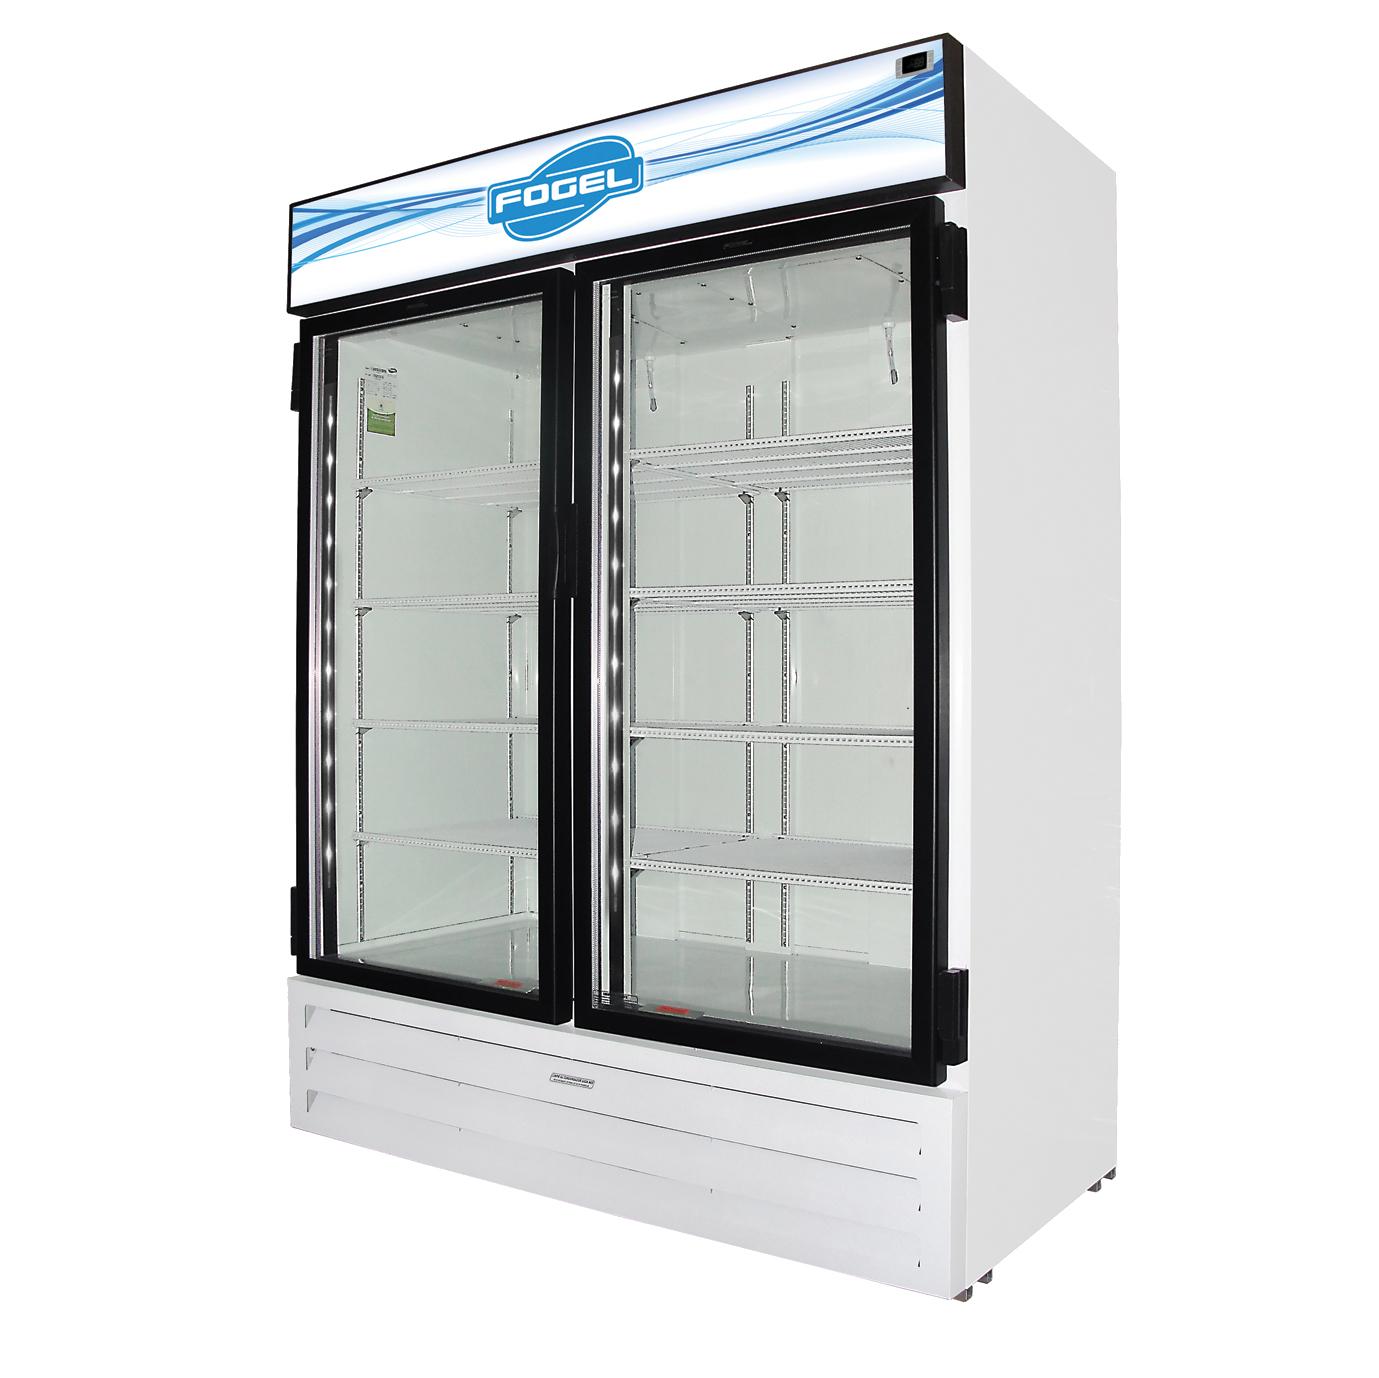 Fogel USA CR-49-HC refrigerator, merchandiser